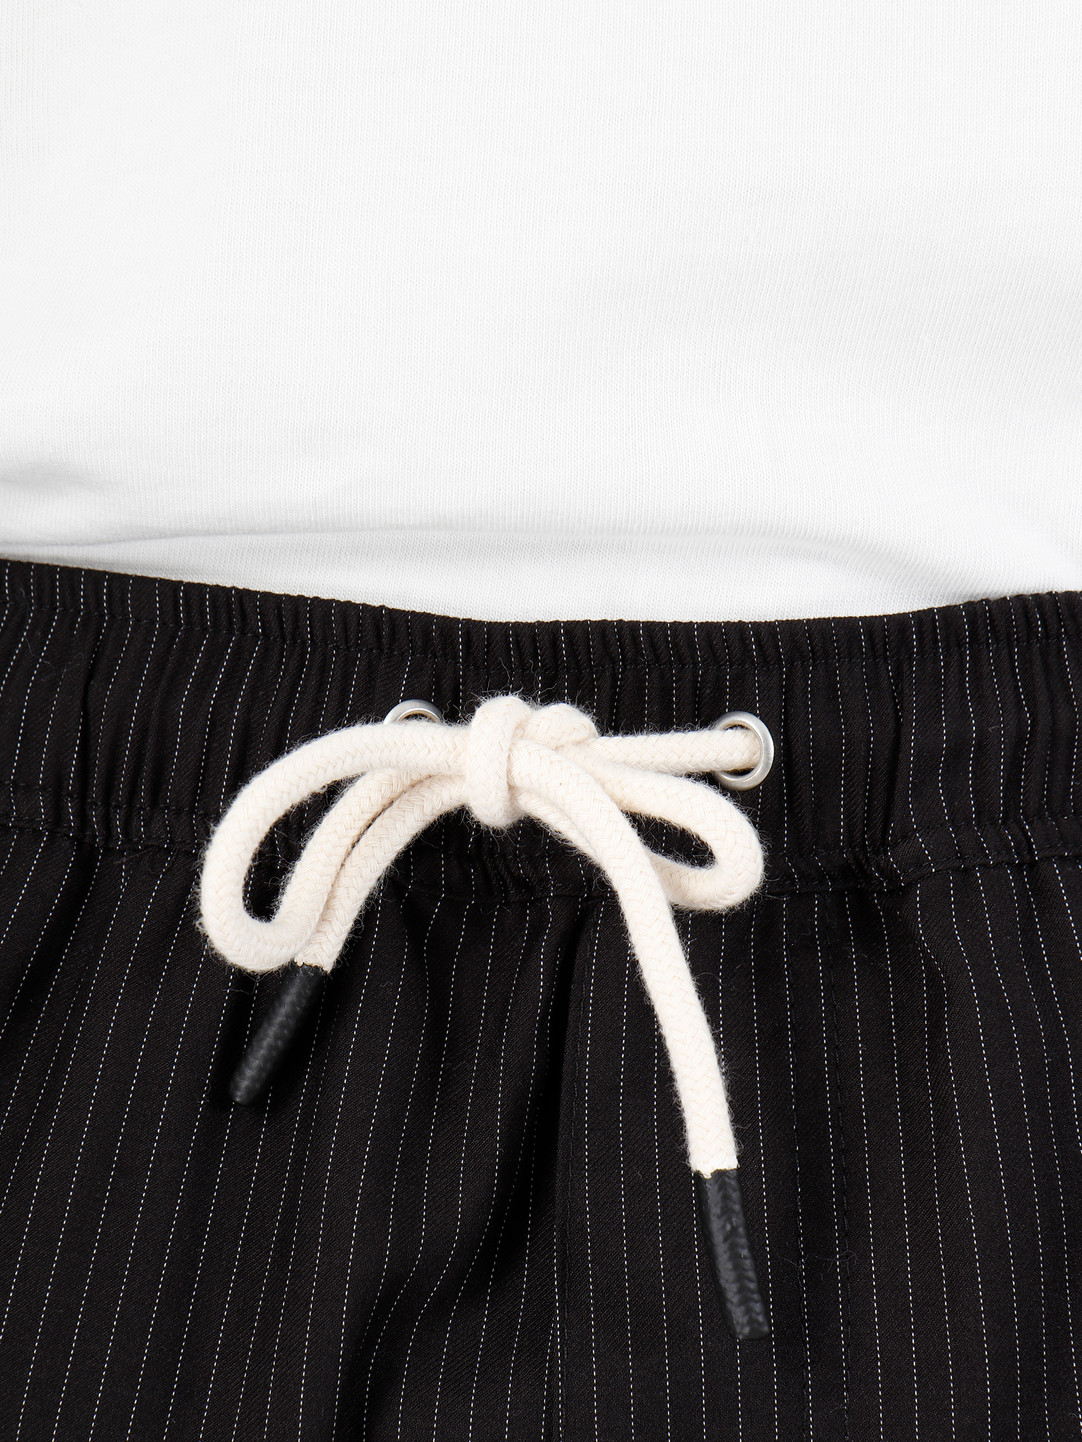 Wemoto Wemoto Rowley Pants Black-White 131.709-117